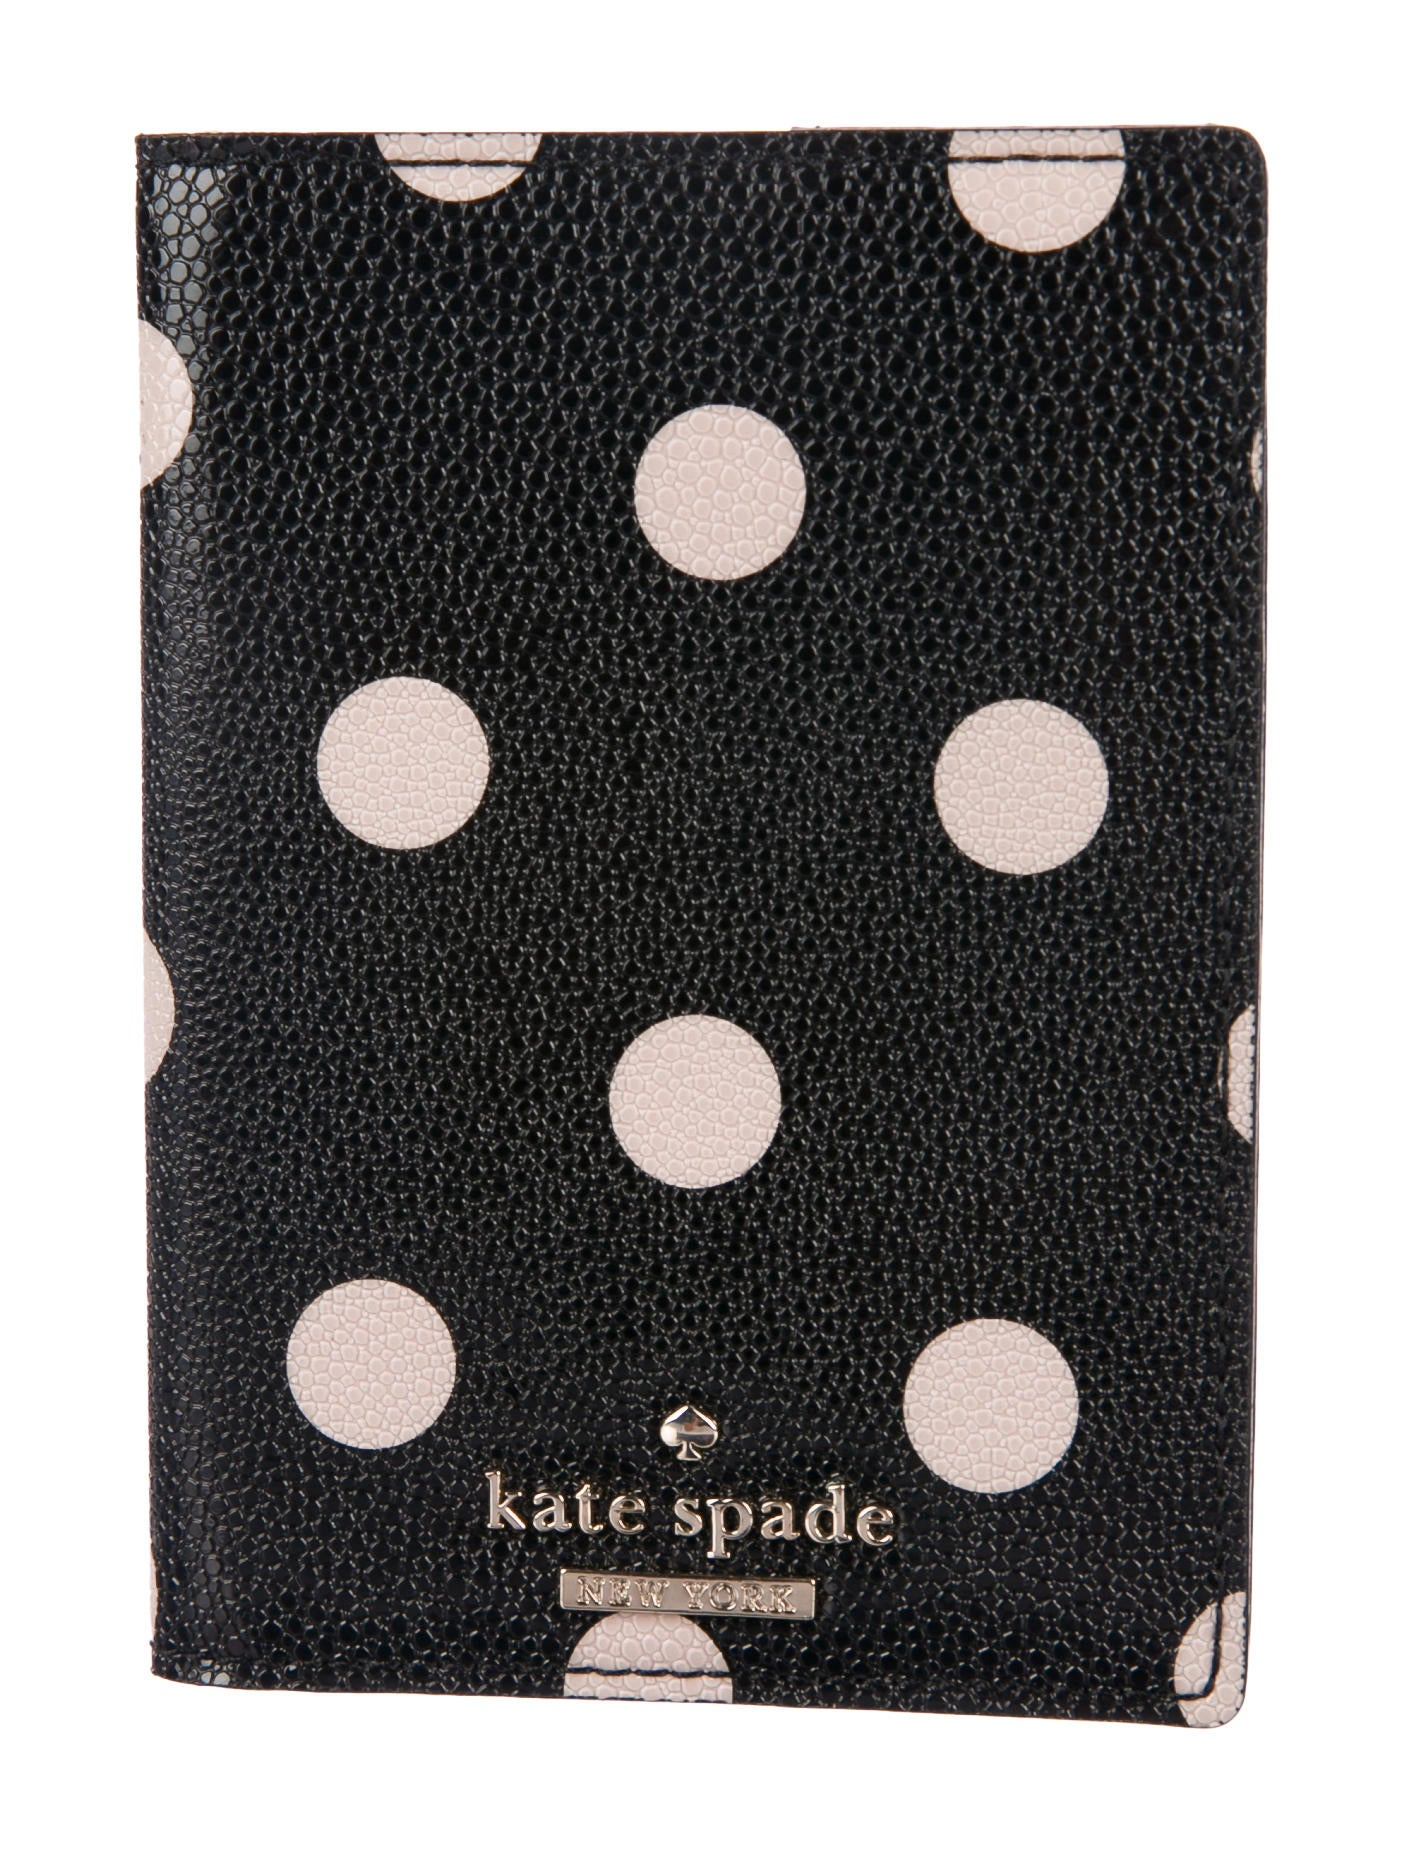 e15b996c262f Kate Spade New York Leather Polkadot Passport Holder - Accessories ...